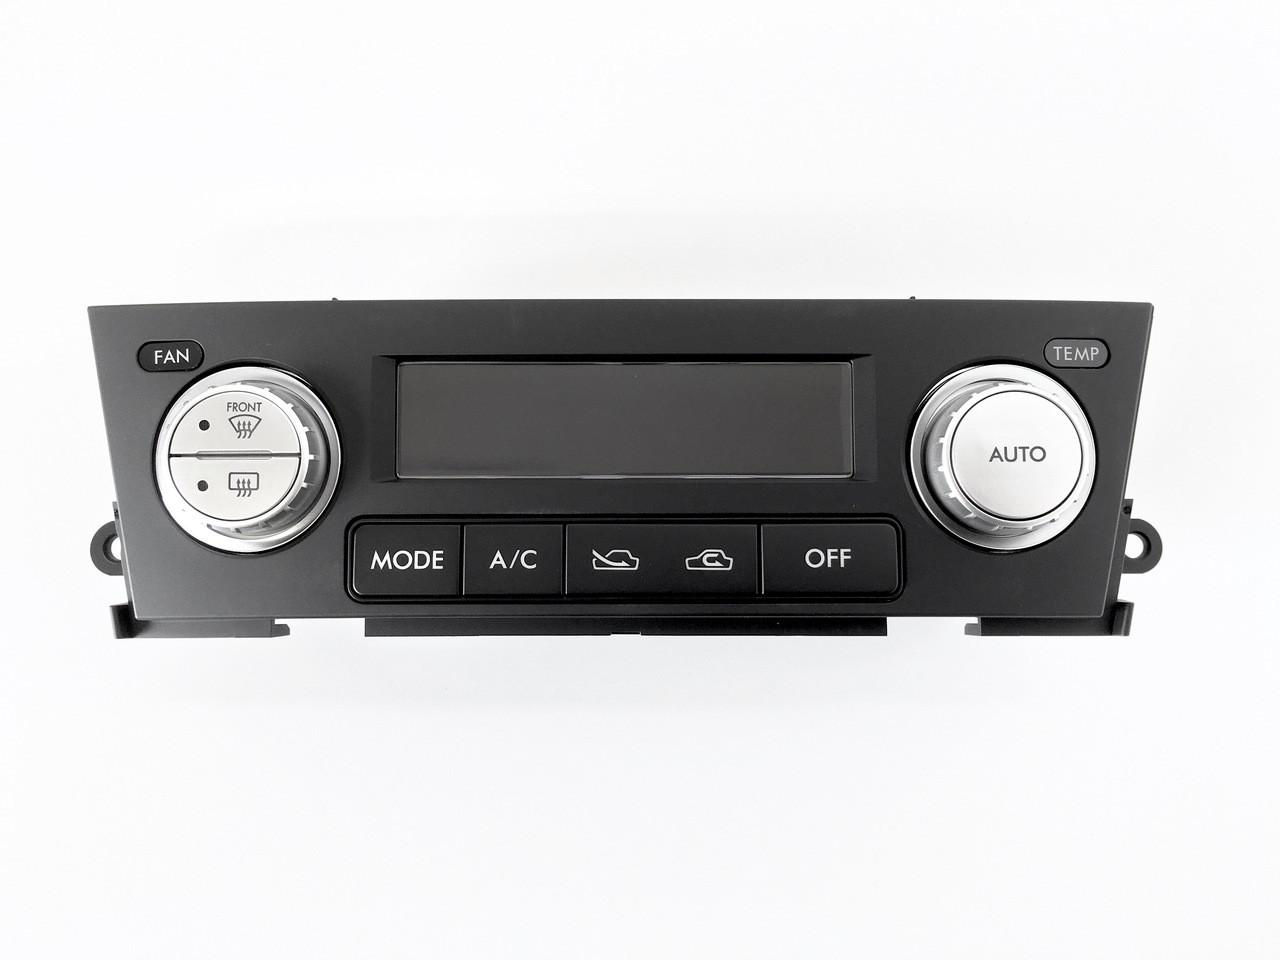 Subaru JDM H6217AG910 Single Zone AV Panel at AVOJDM